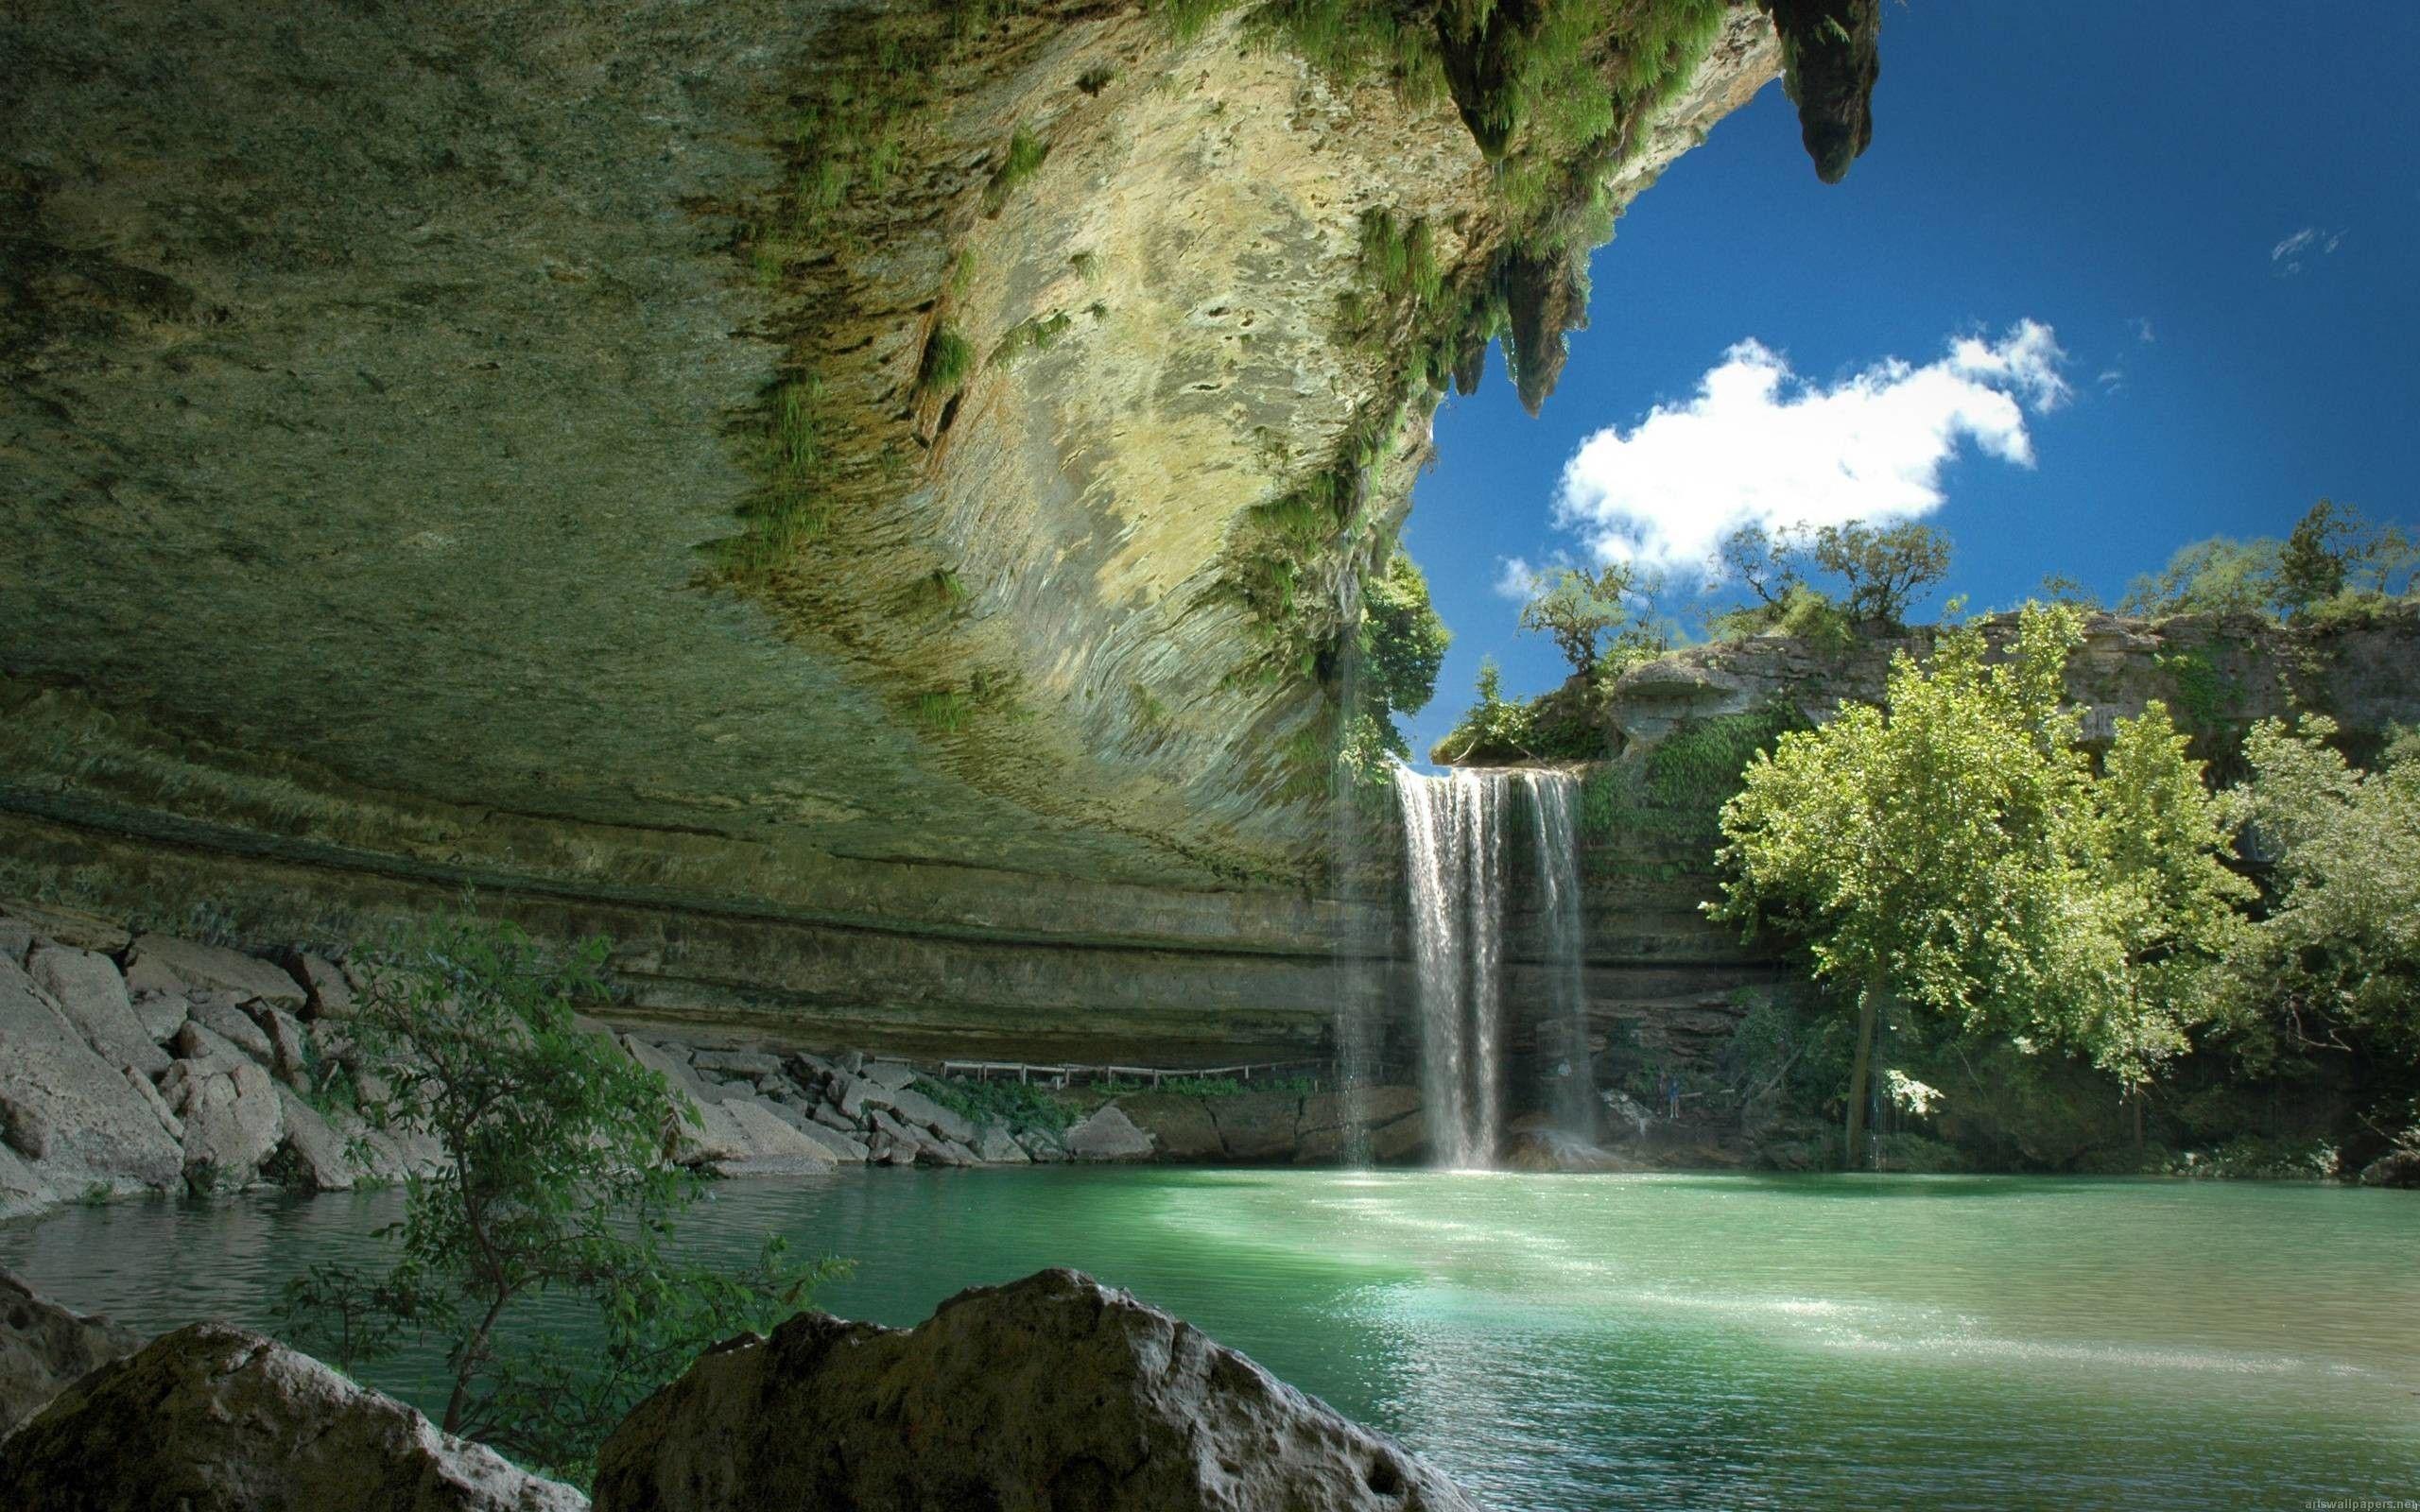 Cool Hd Wallpapers Widescreen 1080p Wallpaper Cave